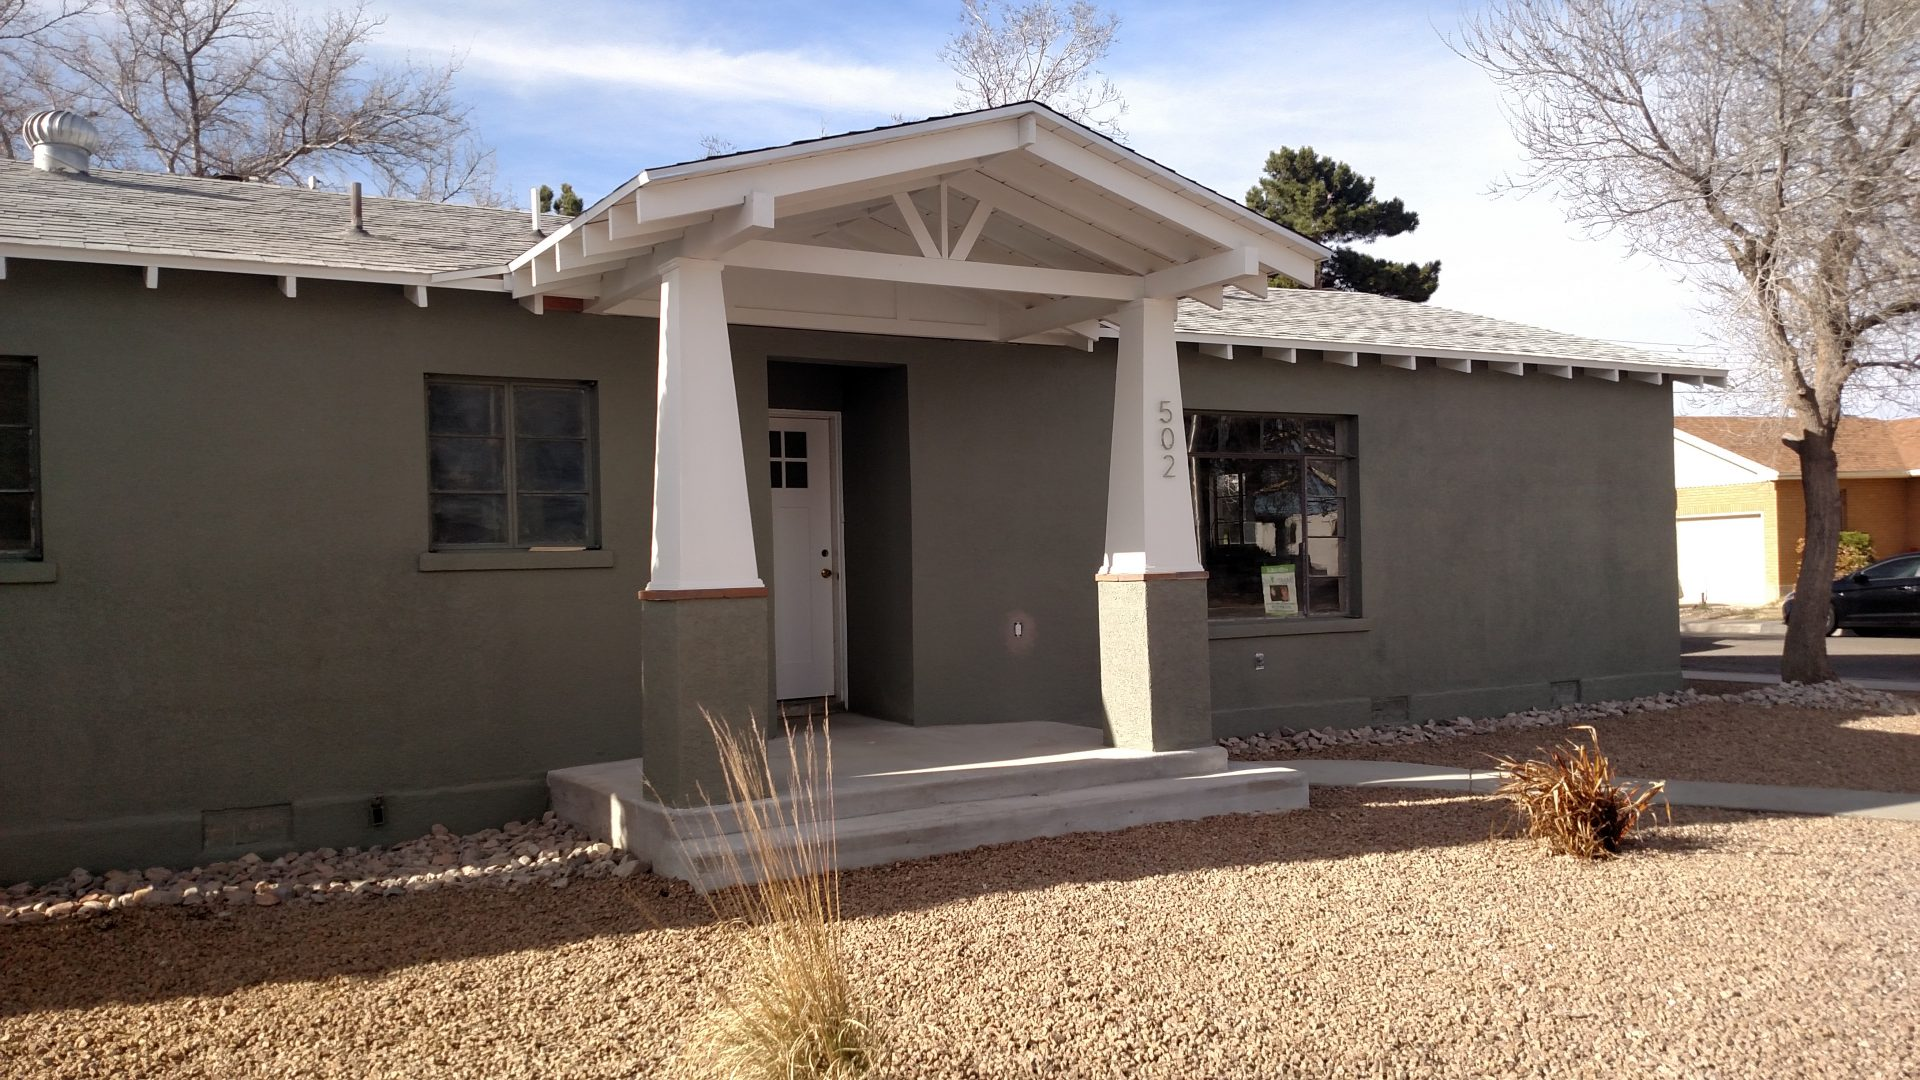 502 Phillips Dr., Las Cruces, NM